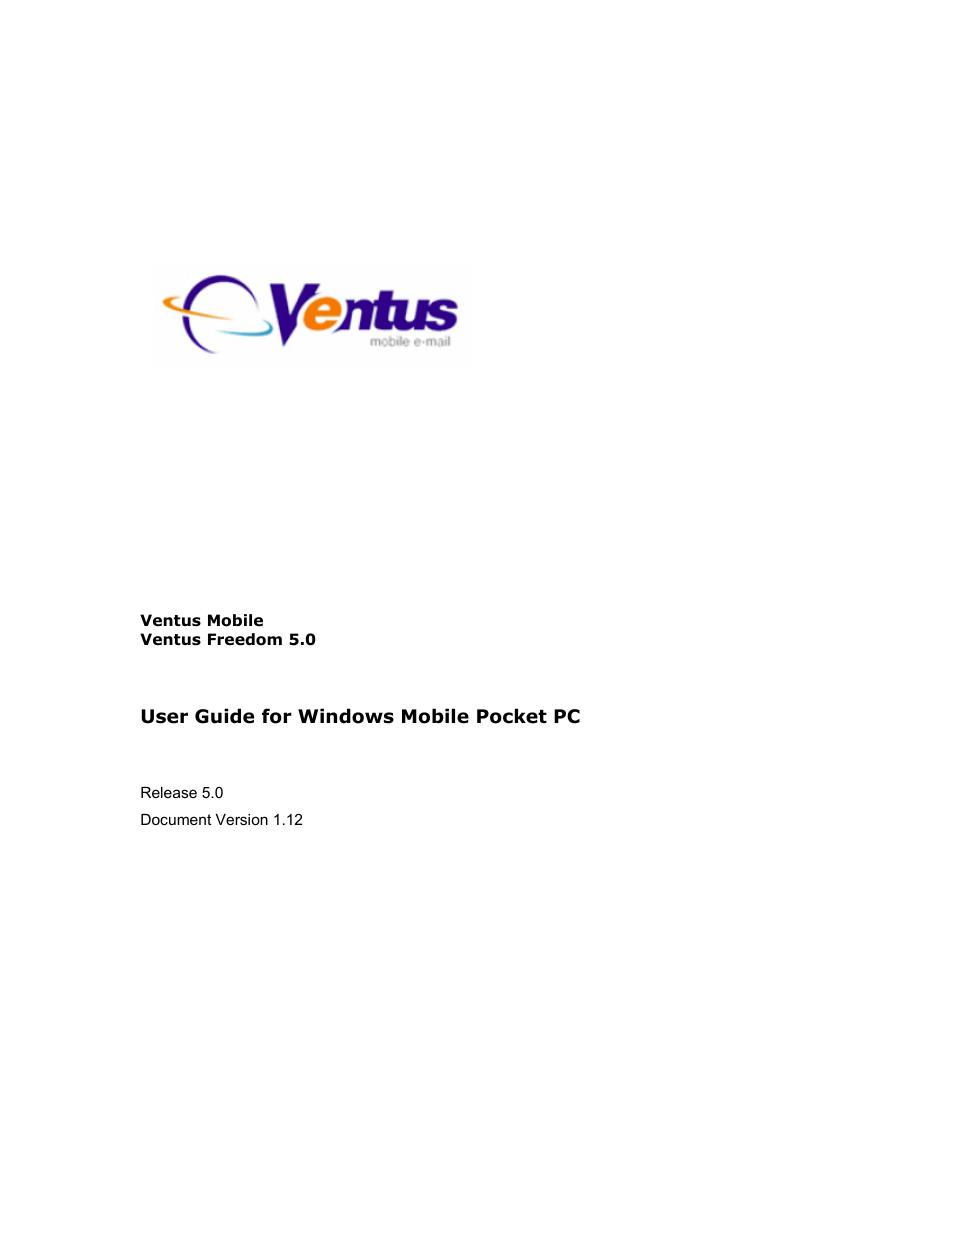 nokia windows mobile pocket pc user manual 31 pages rh manualsdir com Windows Mobile 6 Windows Mobile 6